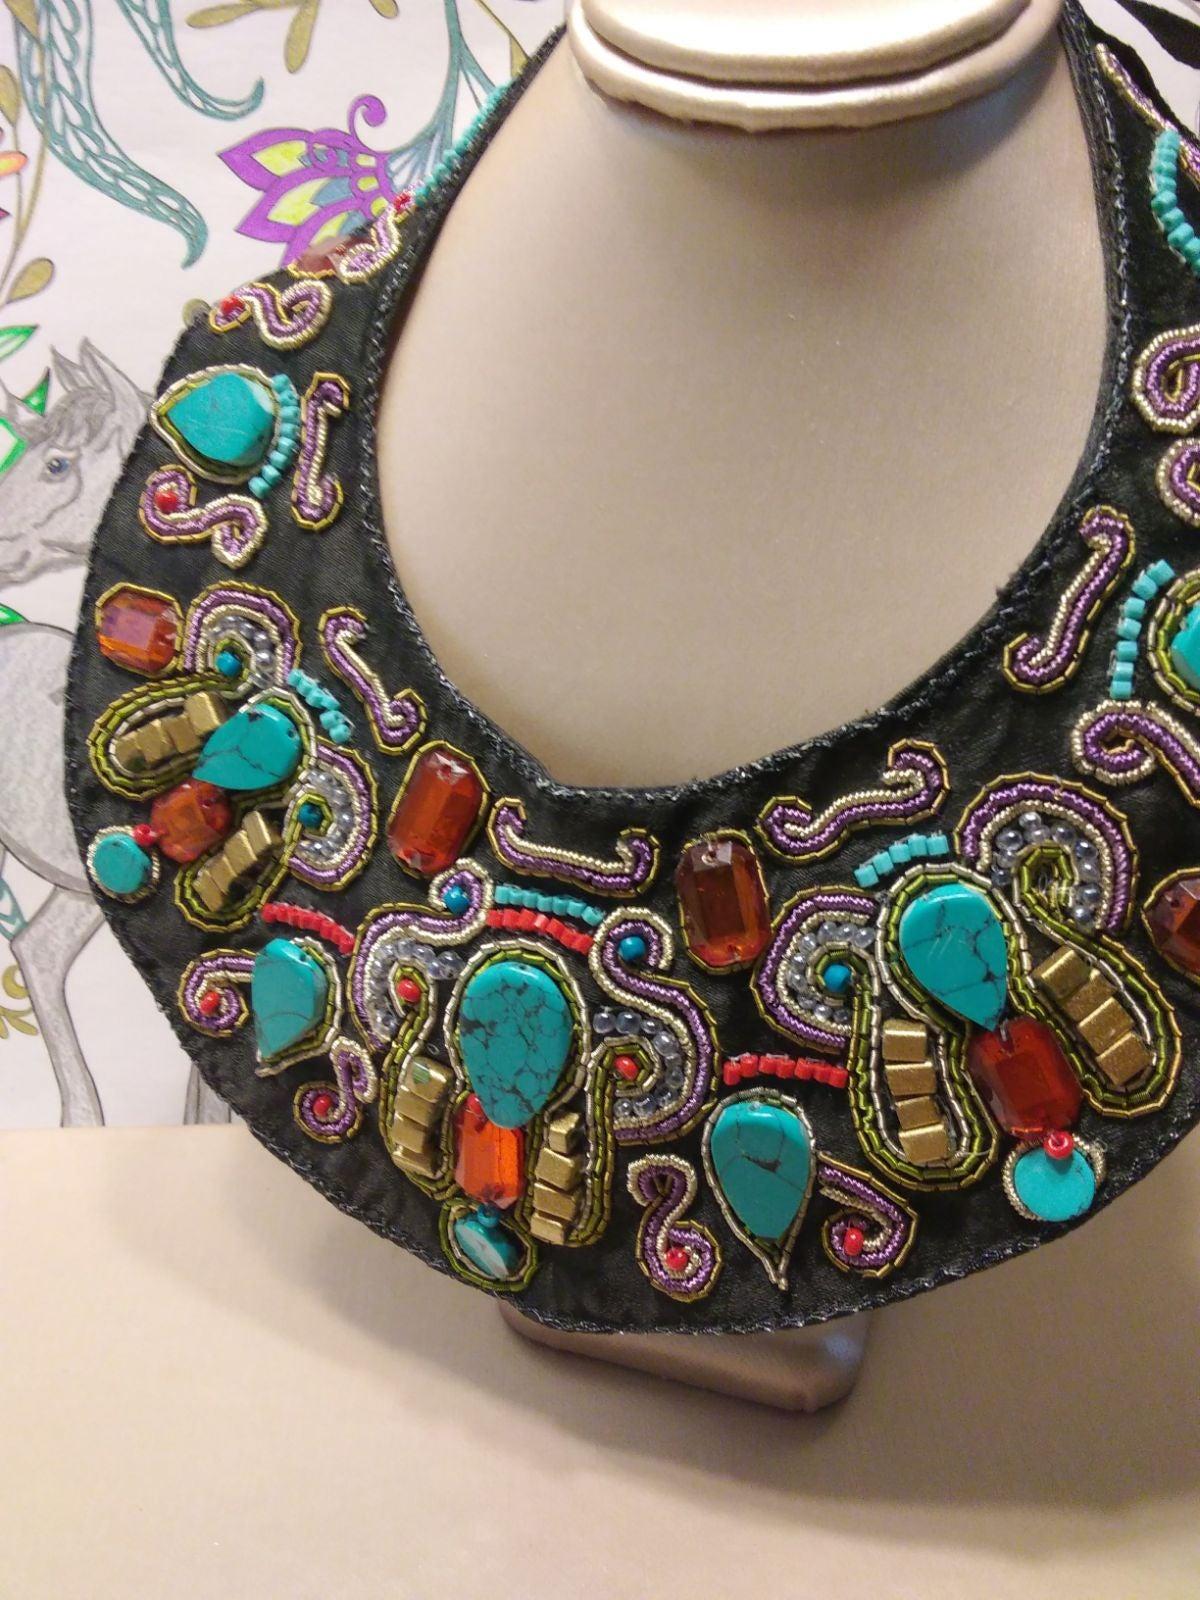 Antique bib necklace